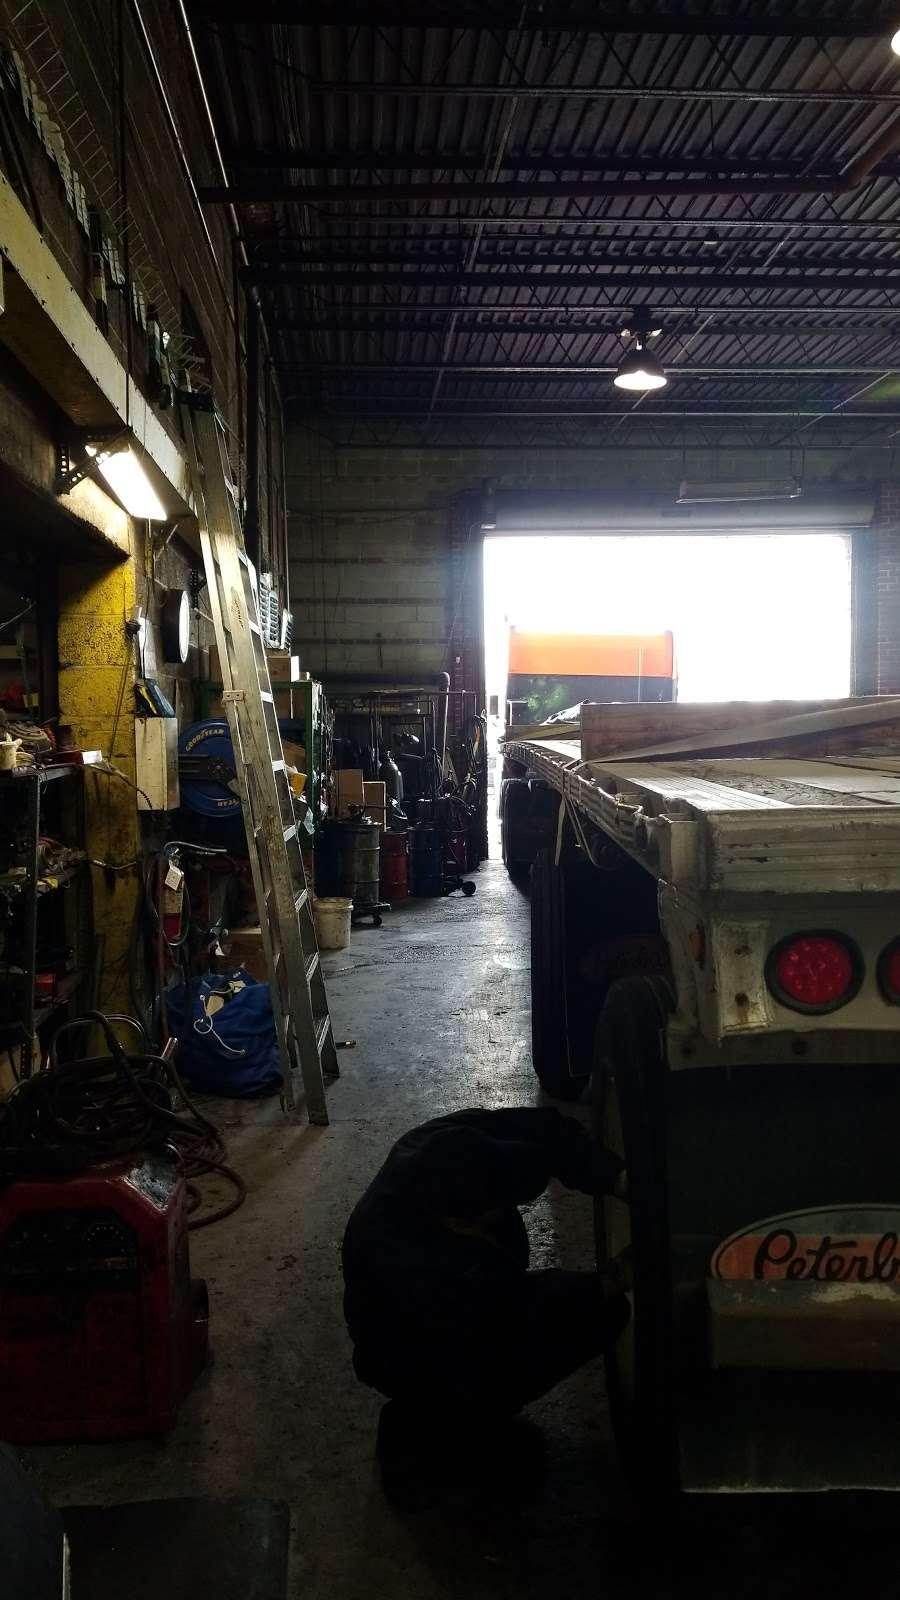 SHK truck repair - car repair  | Photo 2 of 2 | Address: 465 Vandervoort Ave #449, Brooklyn, NY 11222, USA | Phone: (718) 388-6588